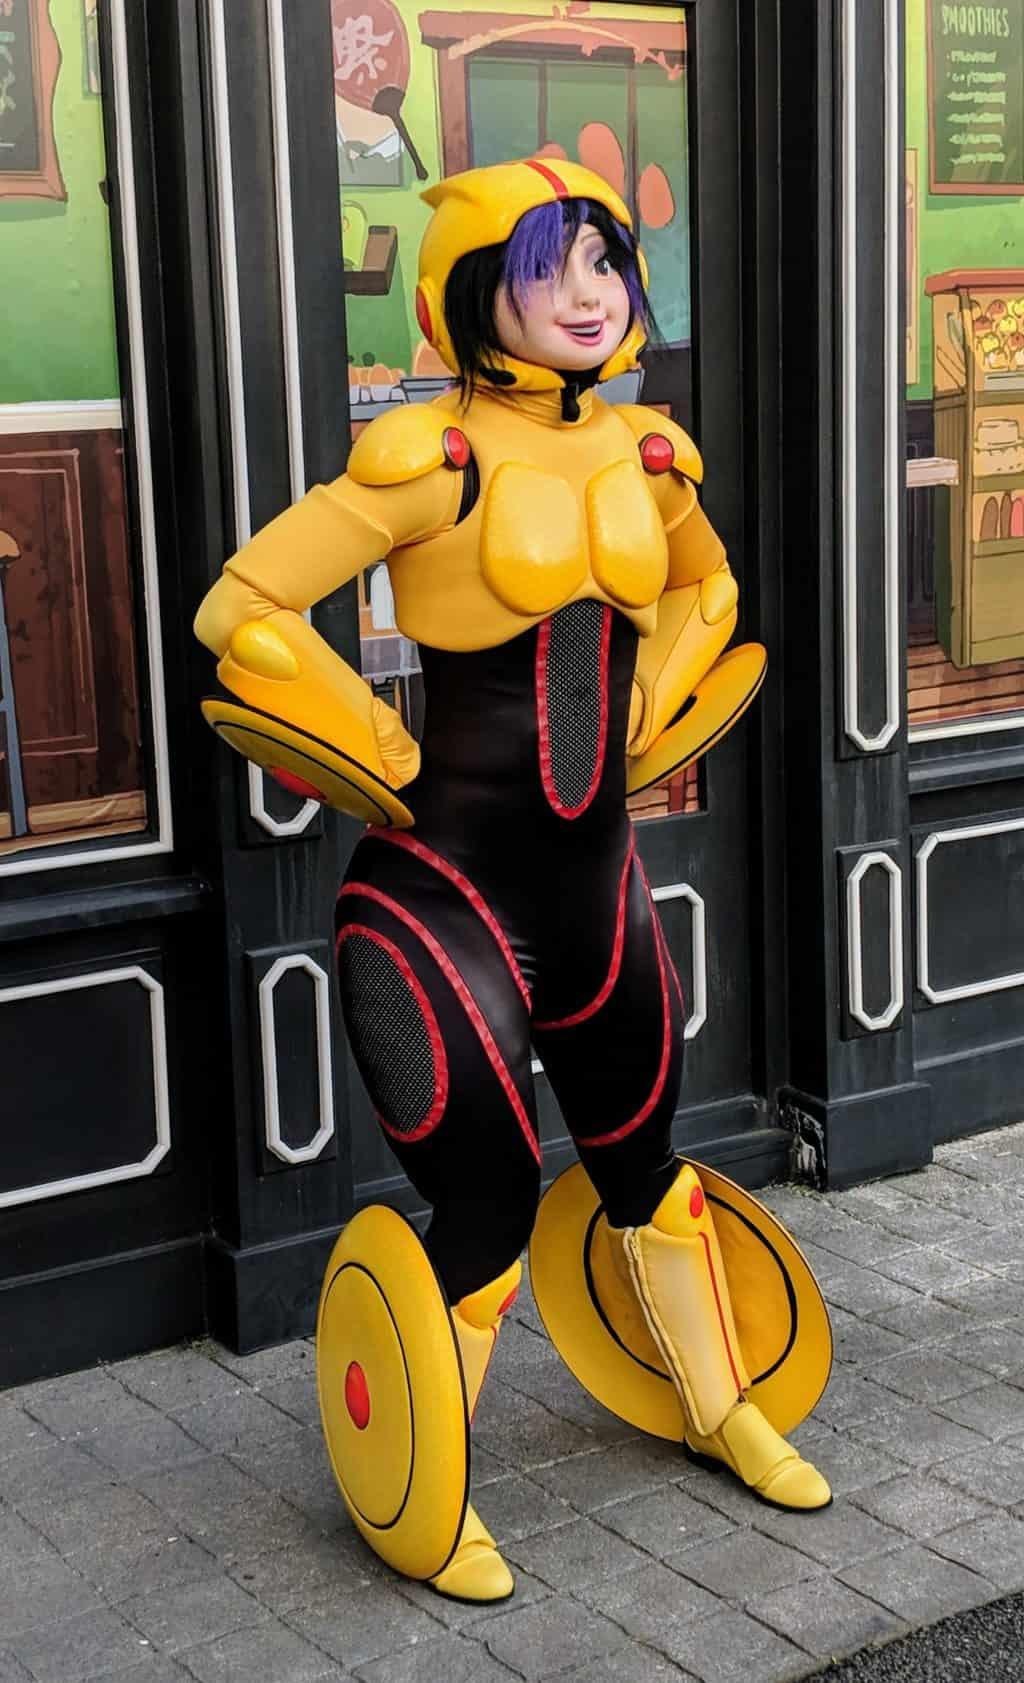 Gogo-Tomago-1-from-Big-Hero-6-at-Fandaze-in-Disneyland-Paris-2018.jpg